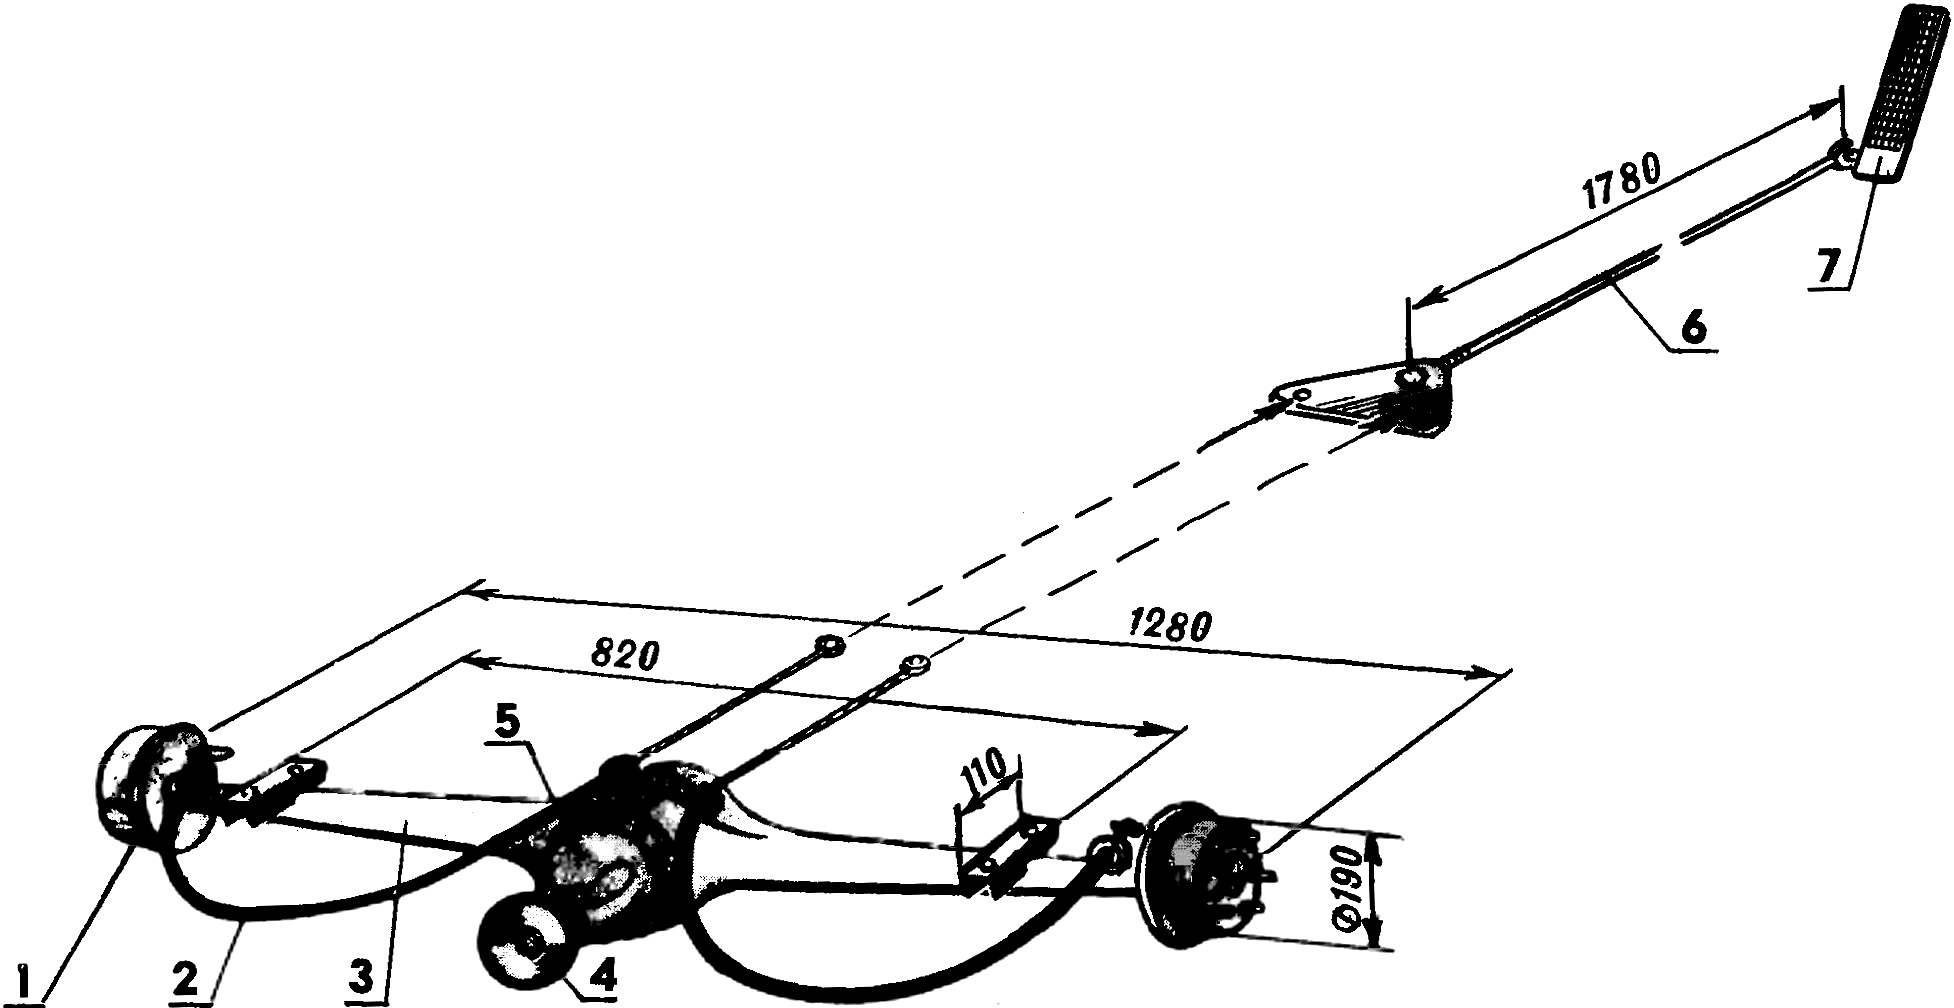 Fig. 4. Rear axle.